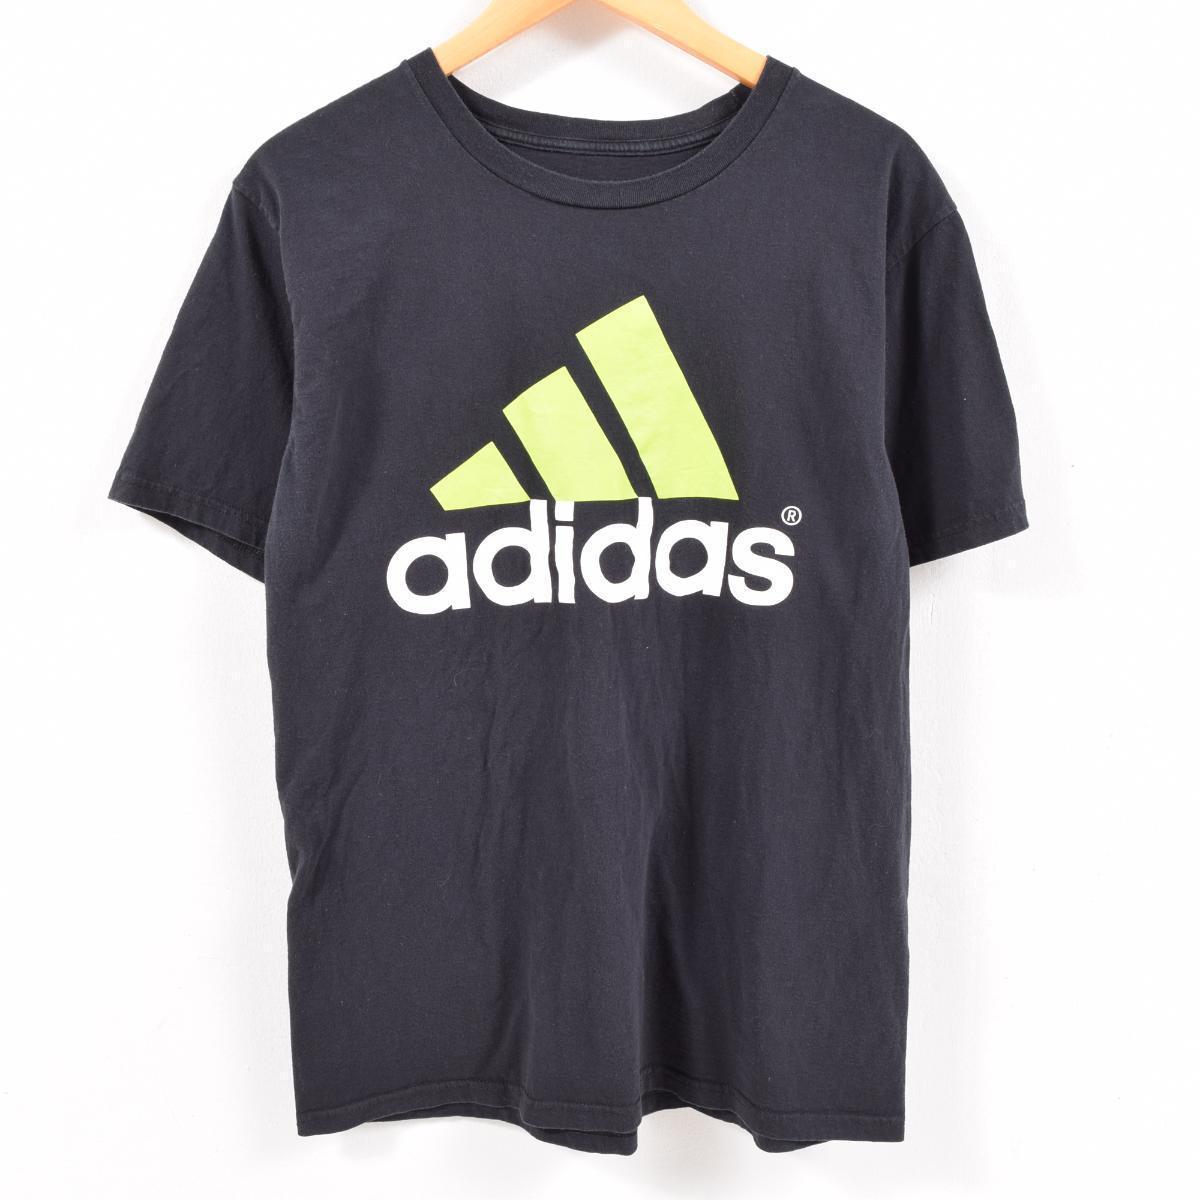 2afac5ea3 Fitnessmode adidas Mens Konn Training Jersey T-Shirt Football Top Black Red  Tee Size S XL